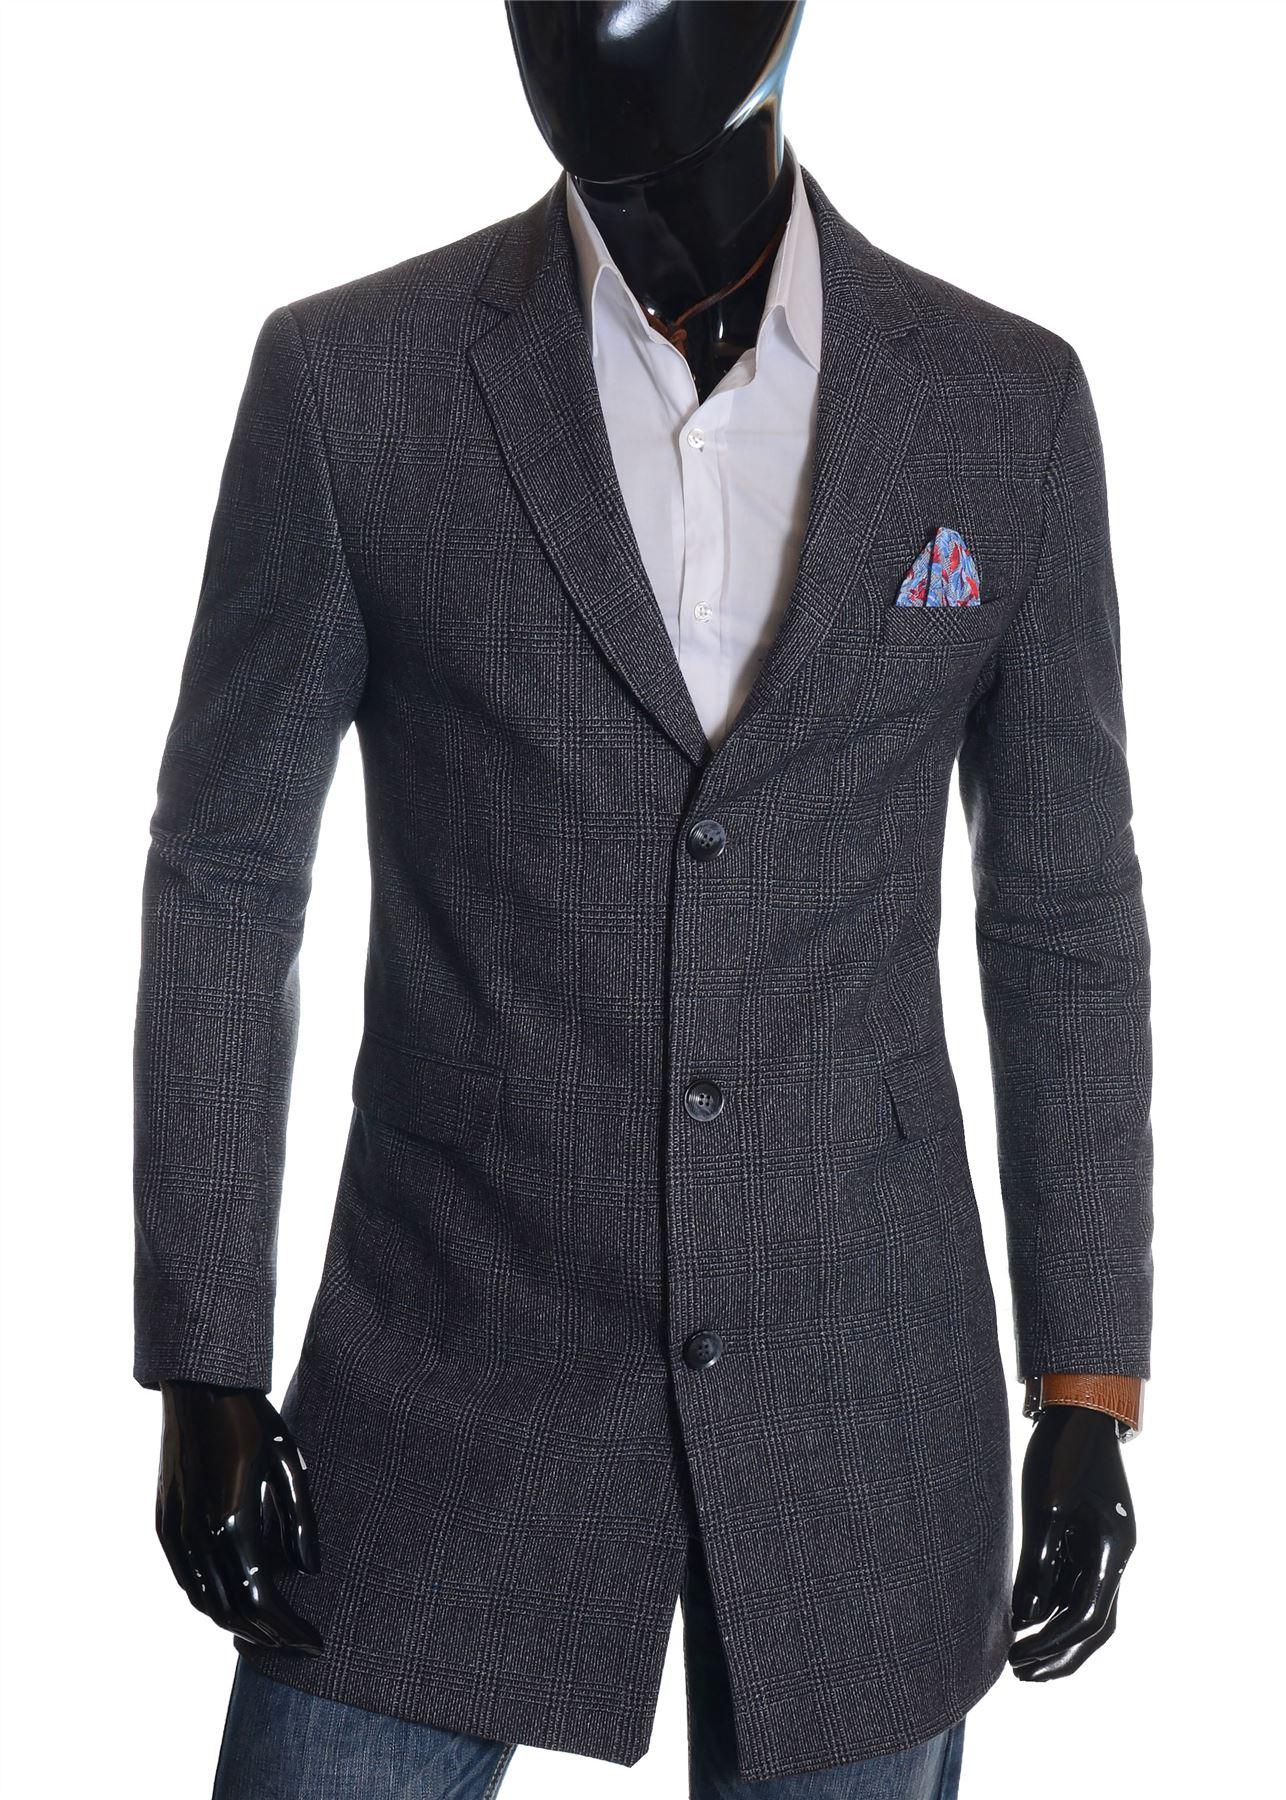 Men-039-s-Checkered-Coat-3-4-Long-Tweed-Cashmere-Wool-Trendy-Formal-Winter-Overcoat thumbnail 25